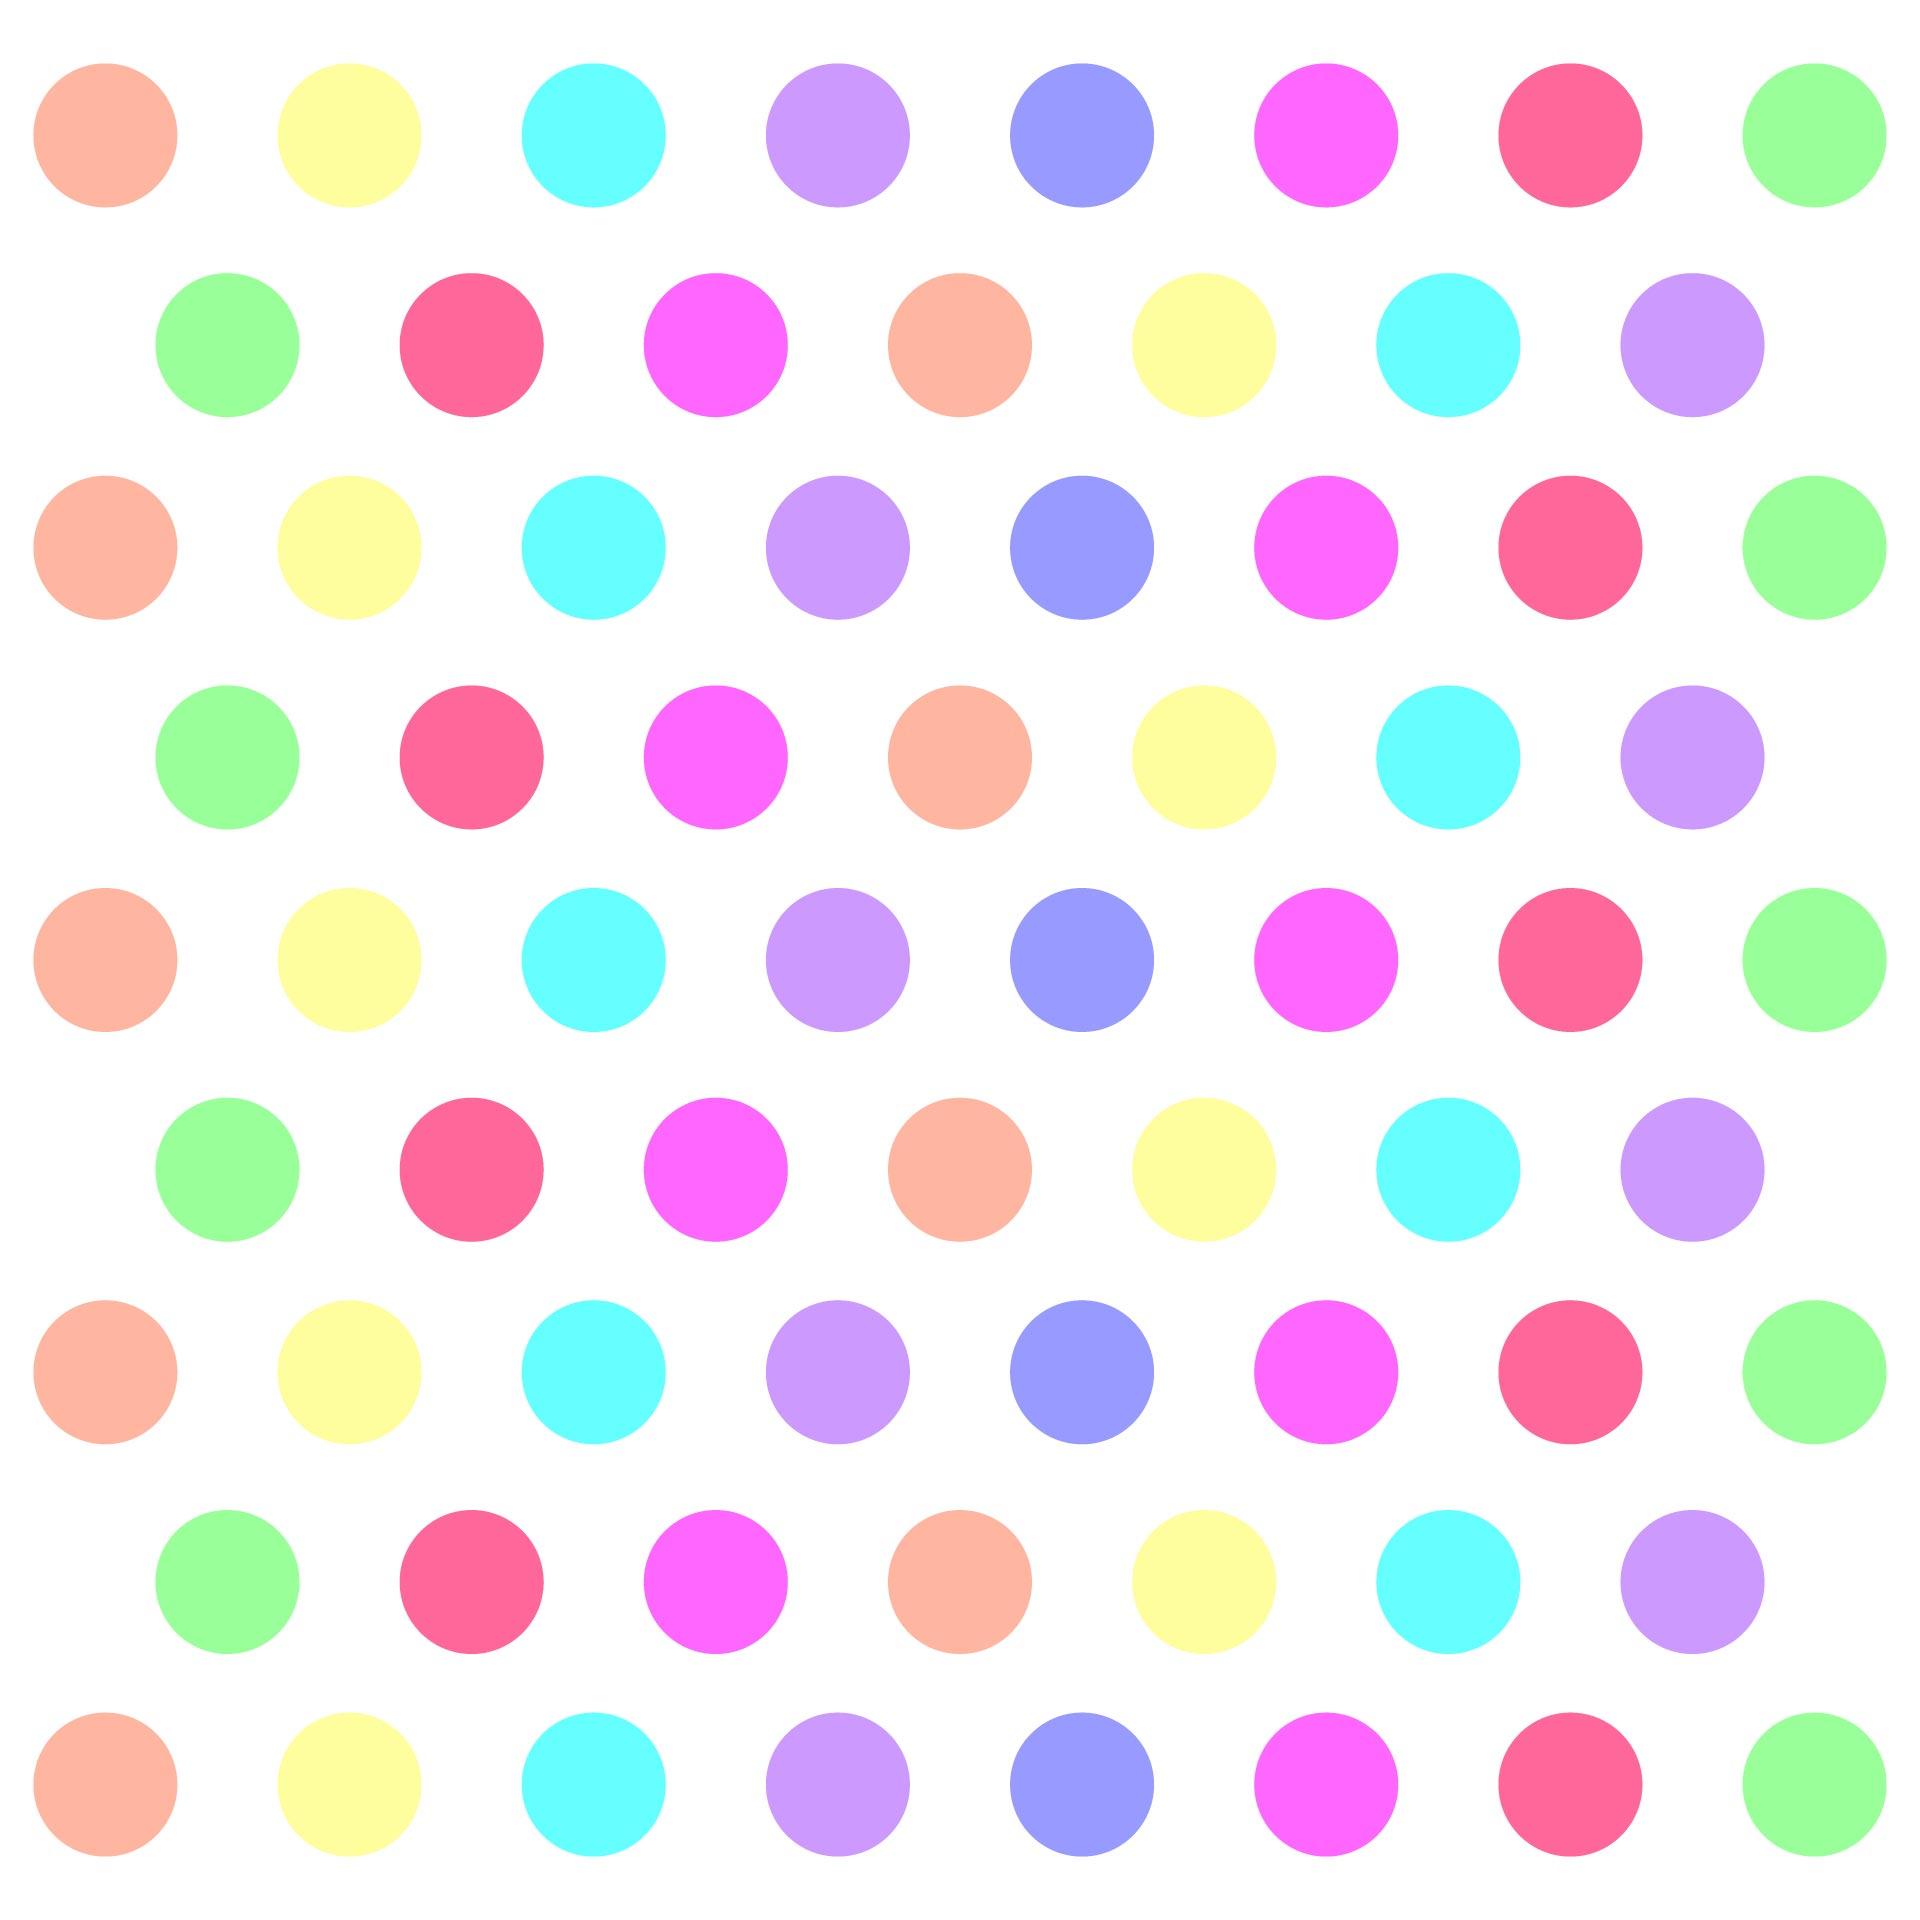 Polka Dot Paper Printable